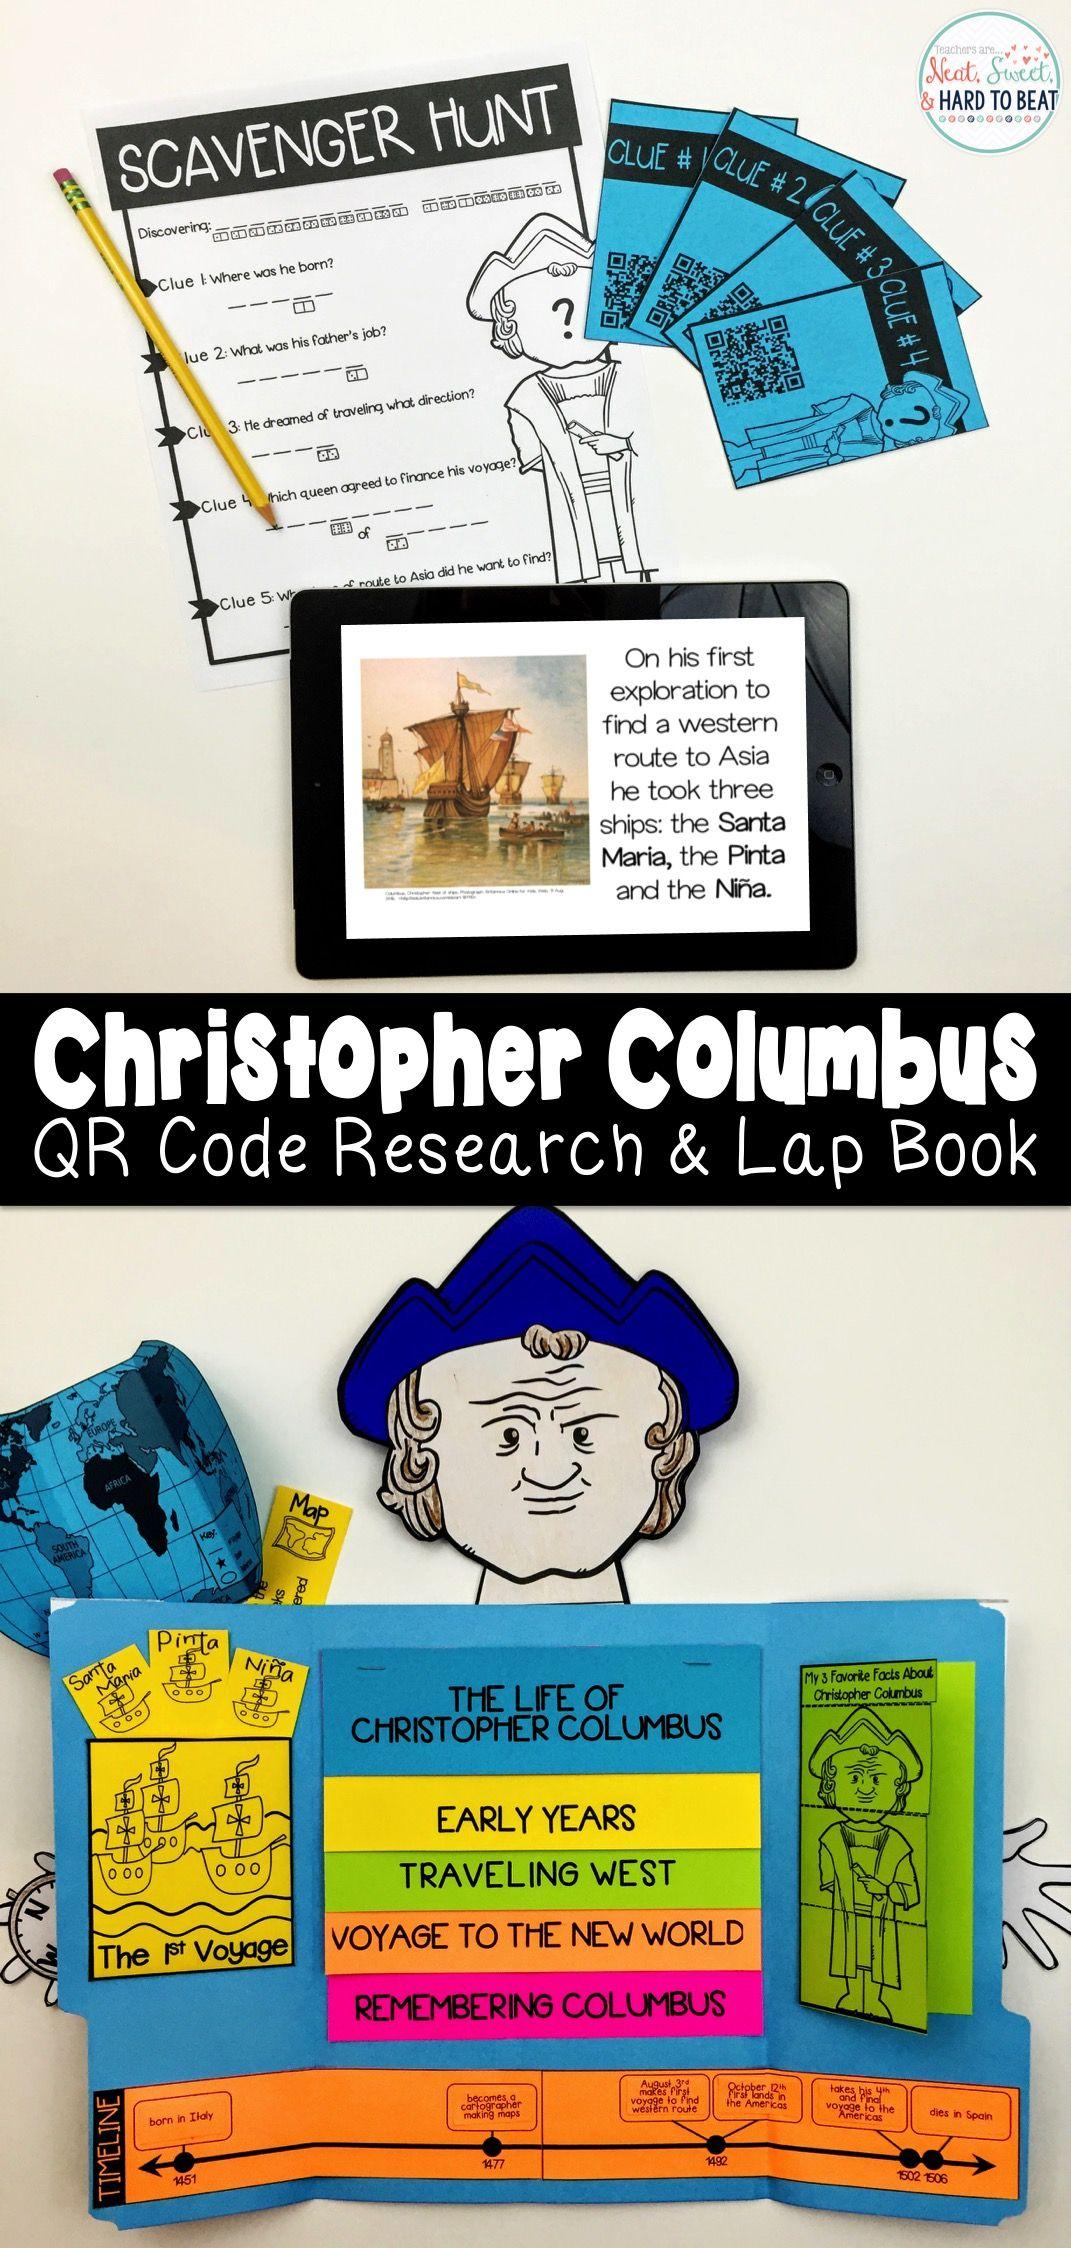 Christopher Columbus Qr Code Scavenger Hunt Amp Research Lap Book With Flip Book